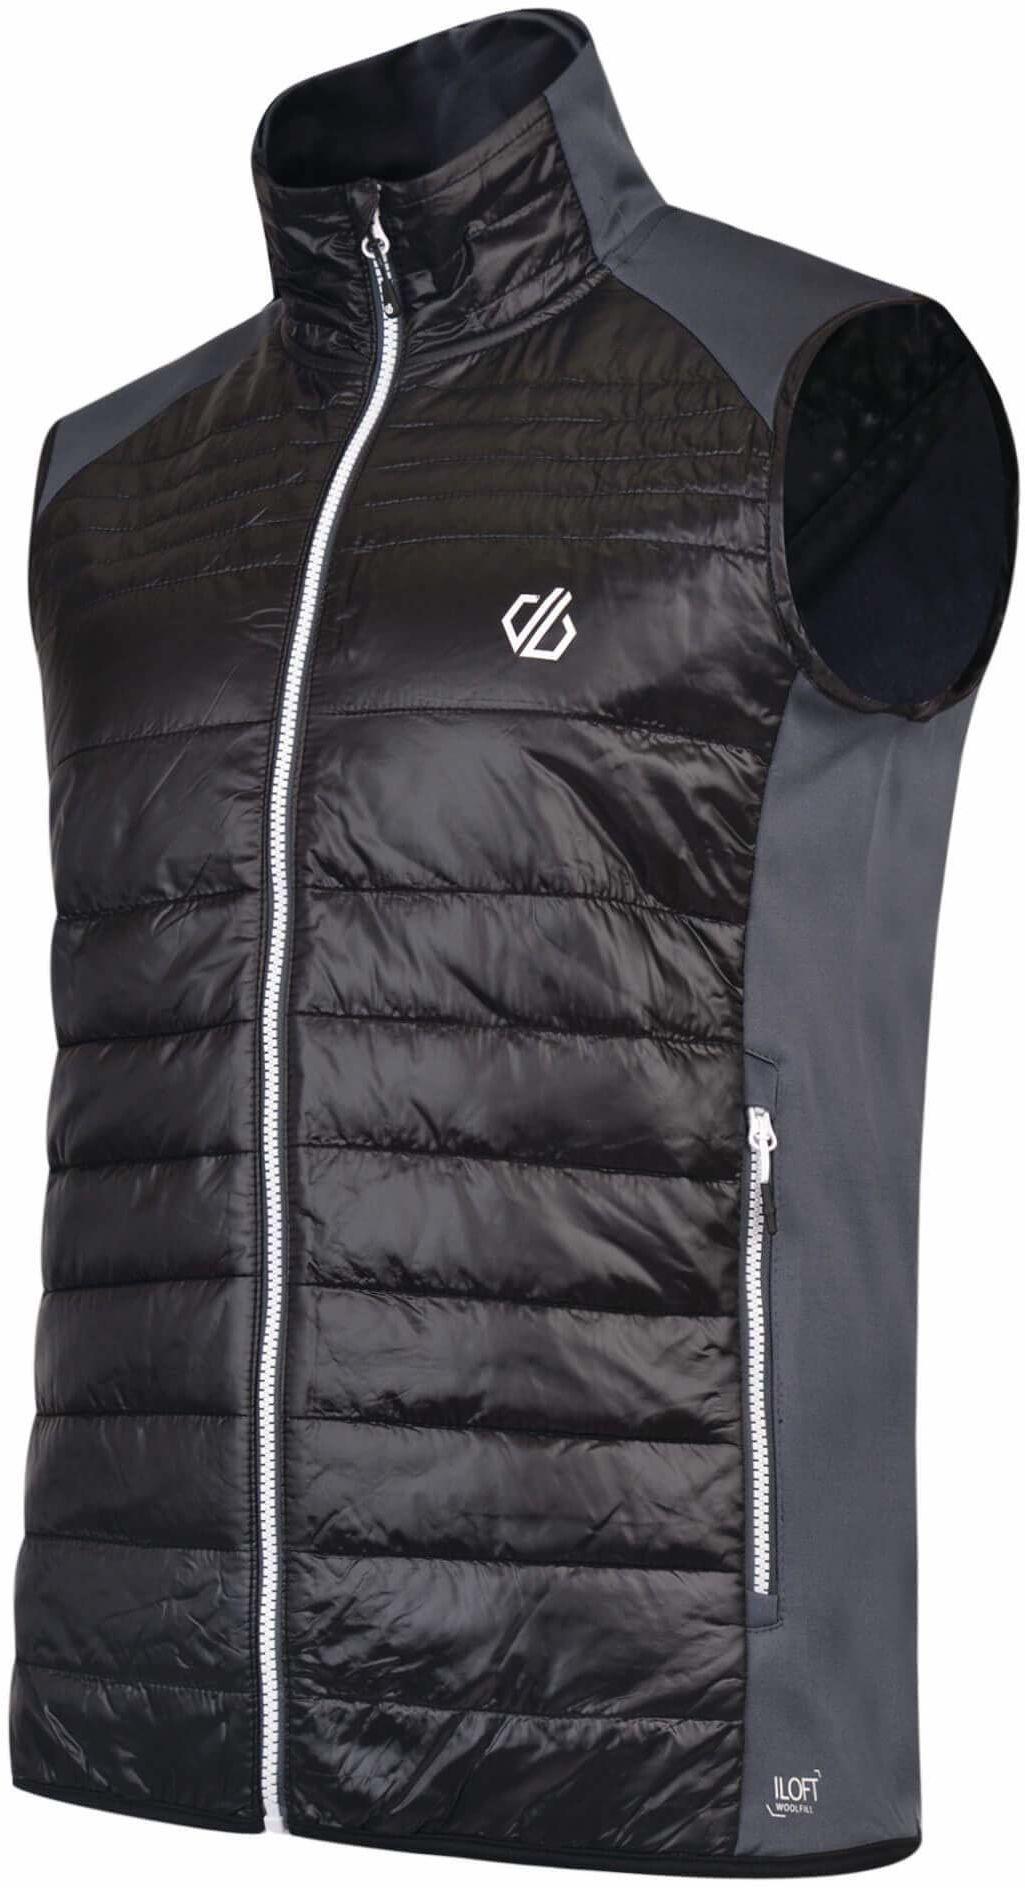 Dare 2b Mountfusion męska kurtka puchowa bez rękawów Montusion Wool 3XL Black/QryGry